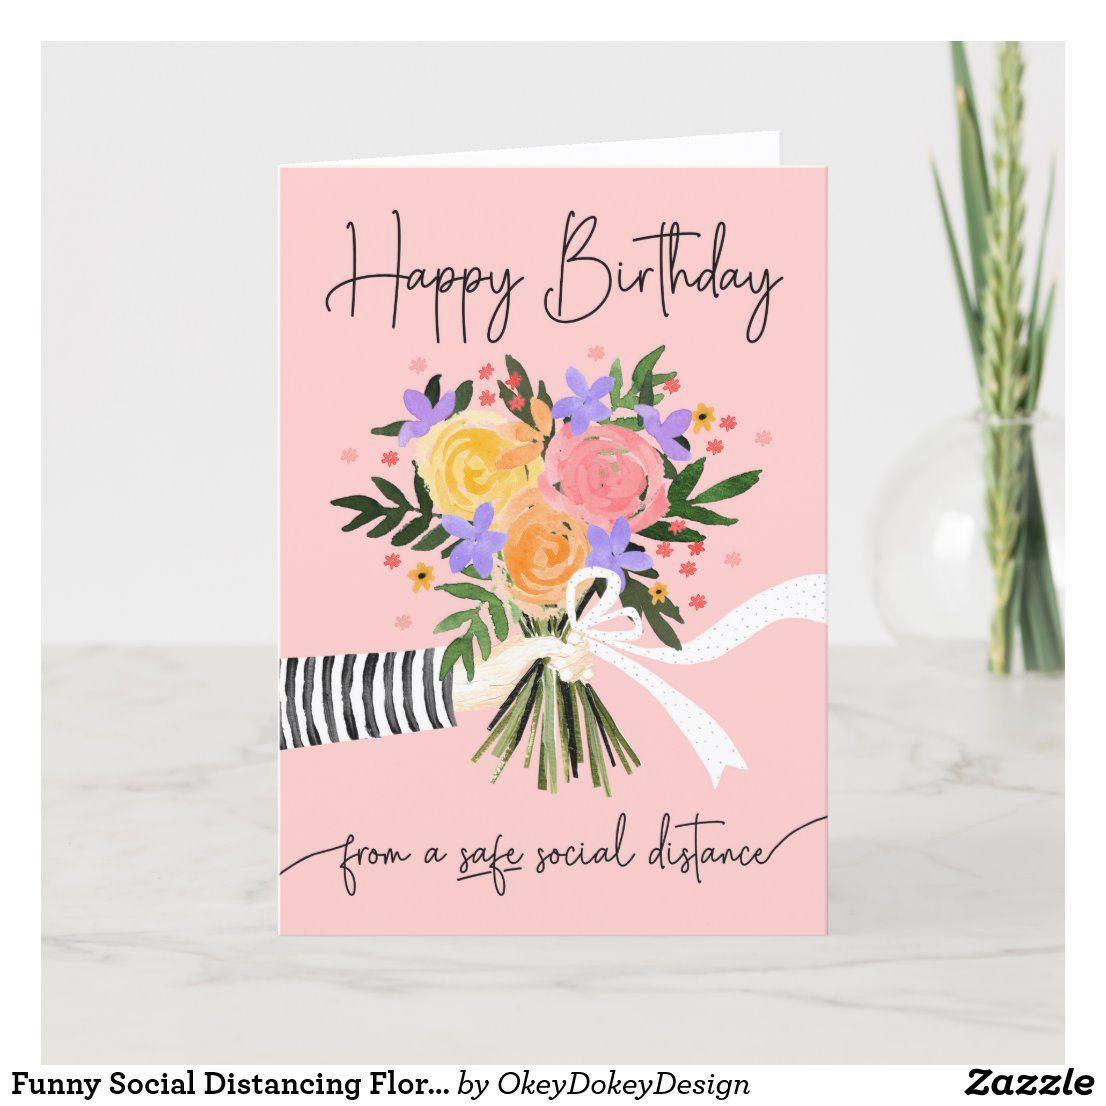 Funny Social Distancing Floral Happy Birthday Card Birthday Cards Greeting Card Shops Happy Birthday Card Funny